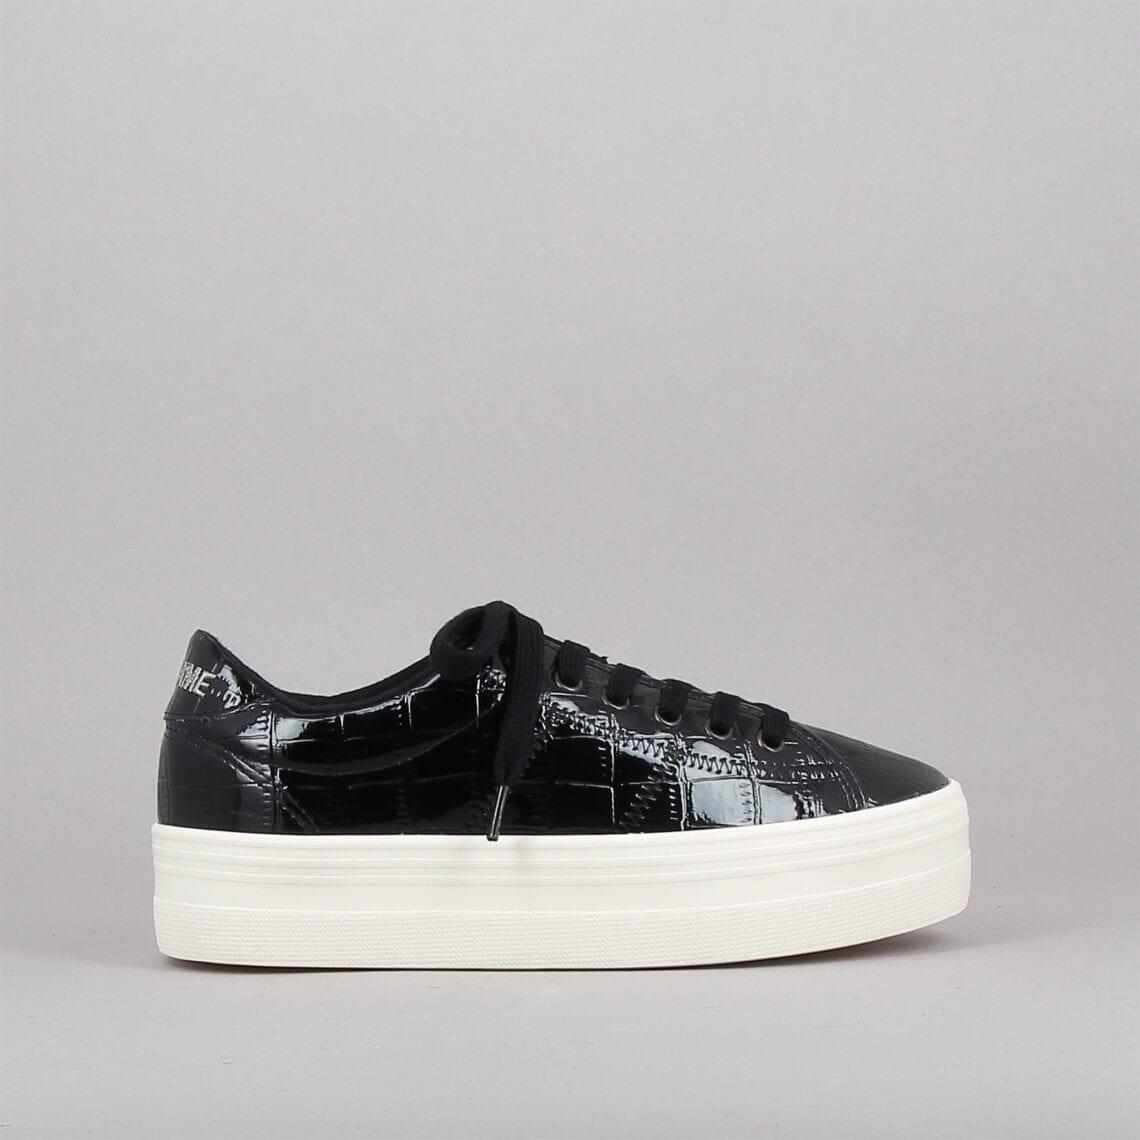 plato-sneaker-croco-noir-181223426-0.jpg